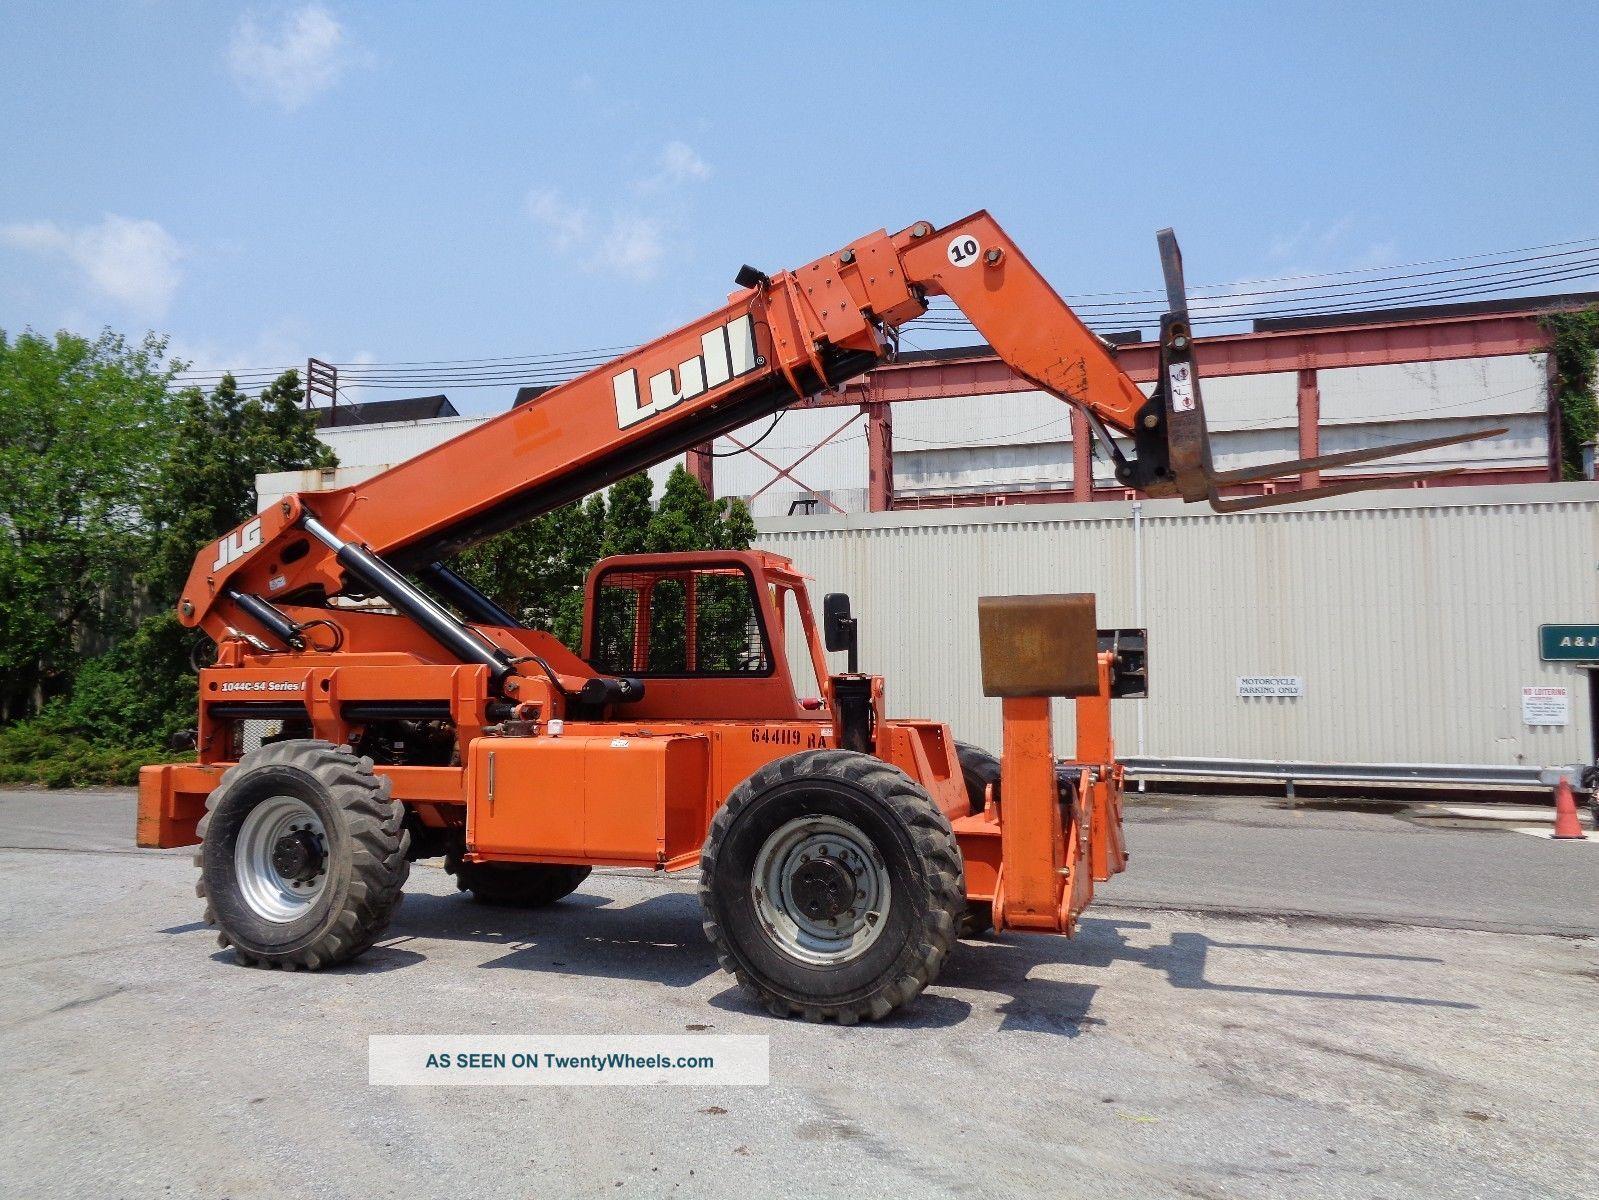 Four Way Side Loader Forklift Mitsubishi Rbm2025k Series: 54 Series2 10, 000 Lbs 4x4 Forklift